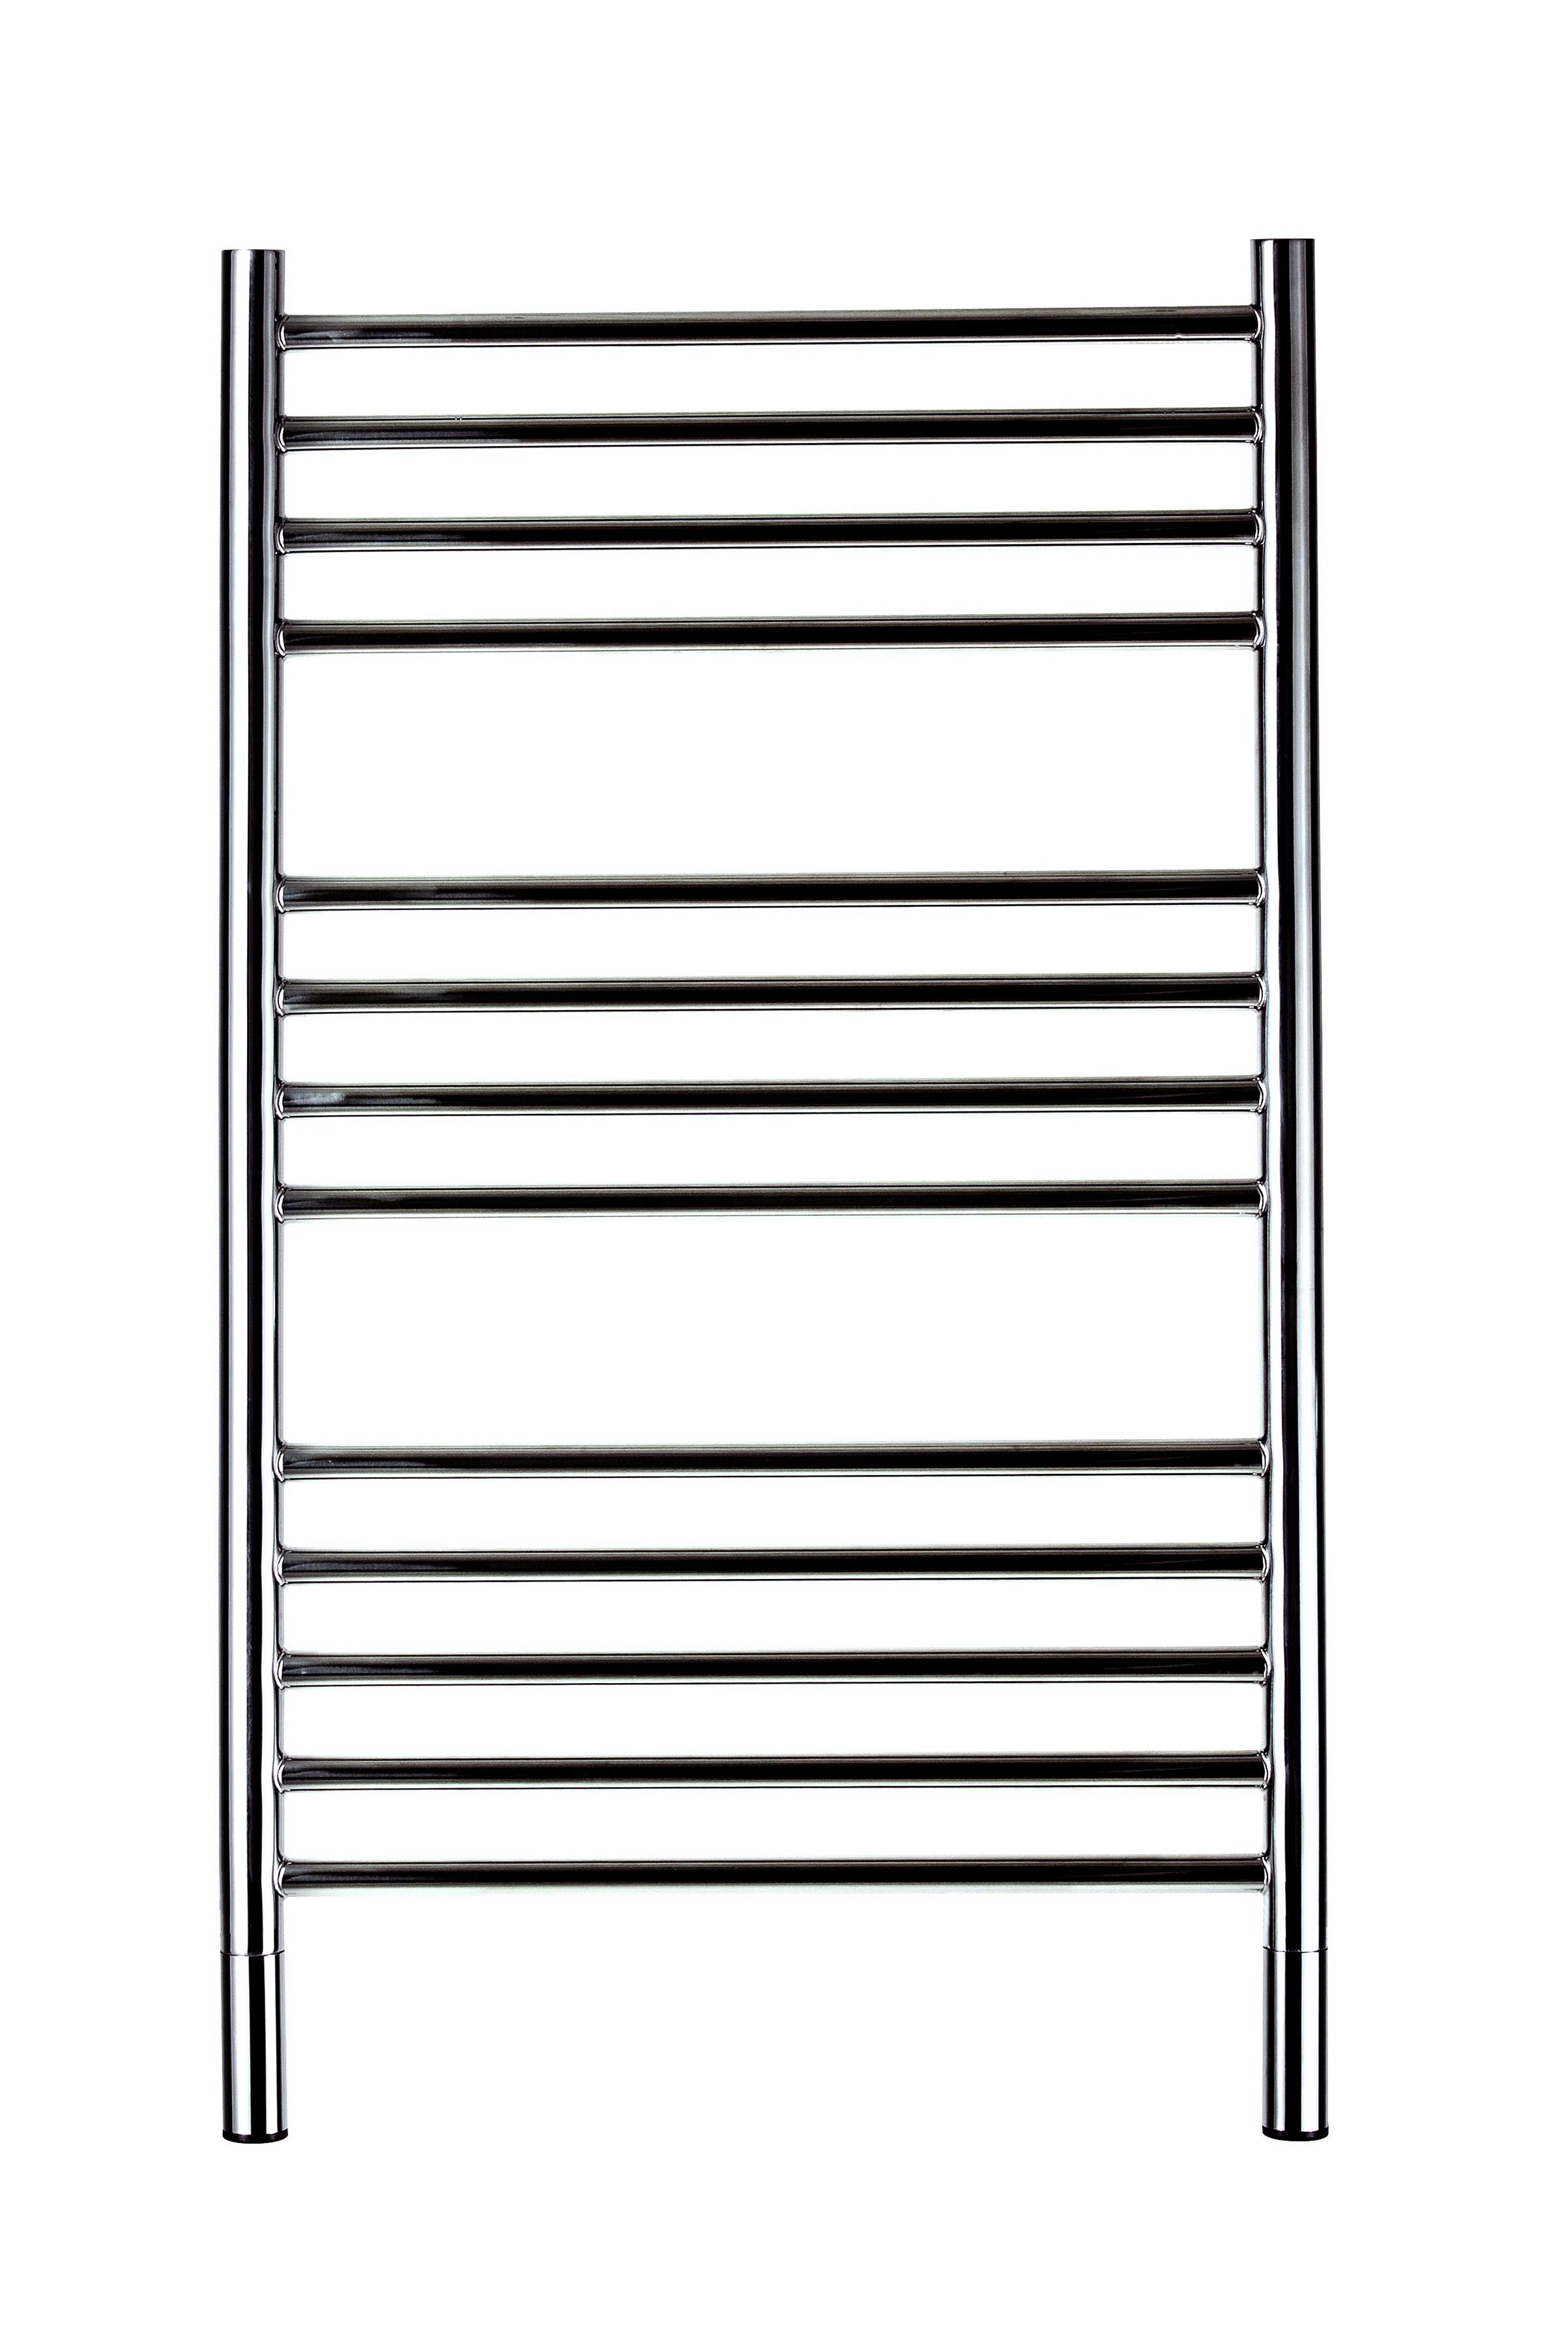 Bathroom radiators towel rails it is represent classic rectangular - Classic C Straight Curved